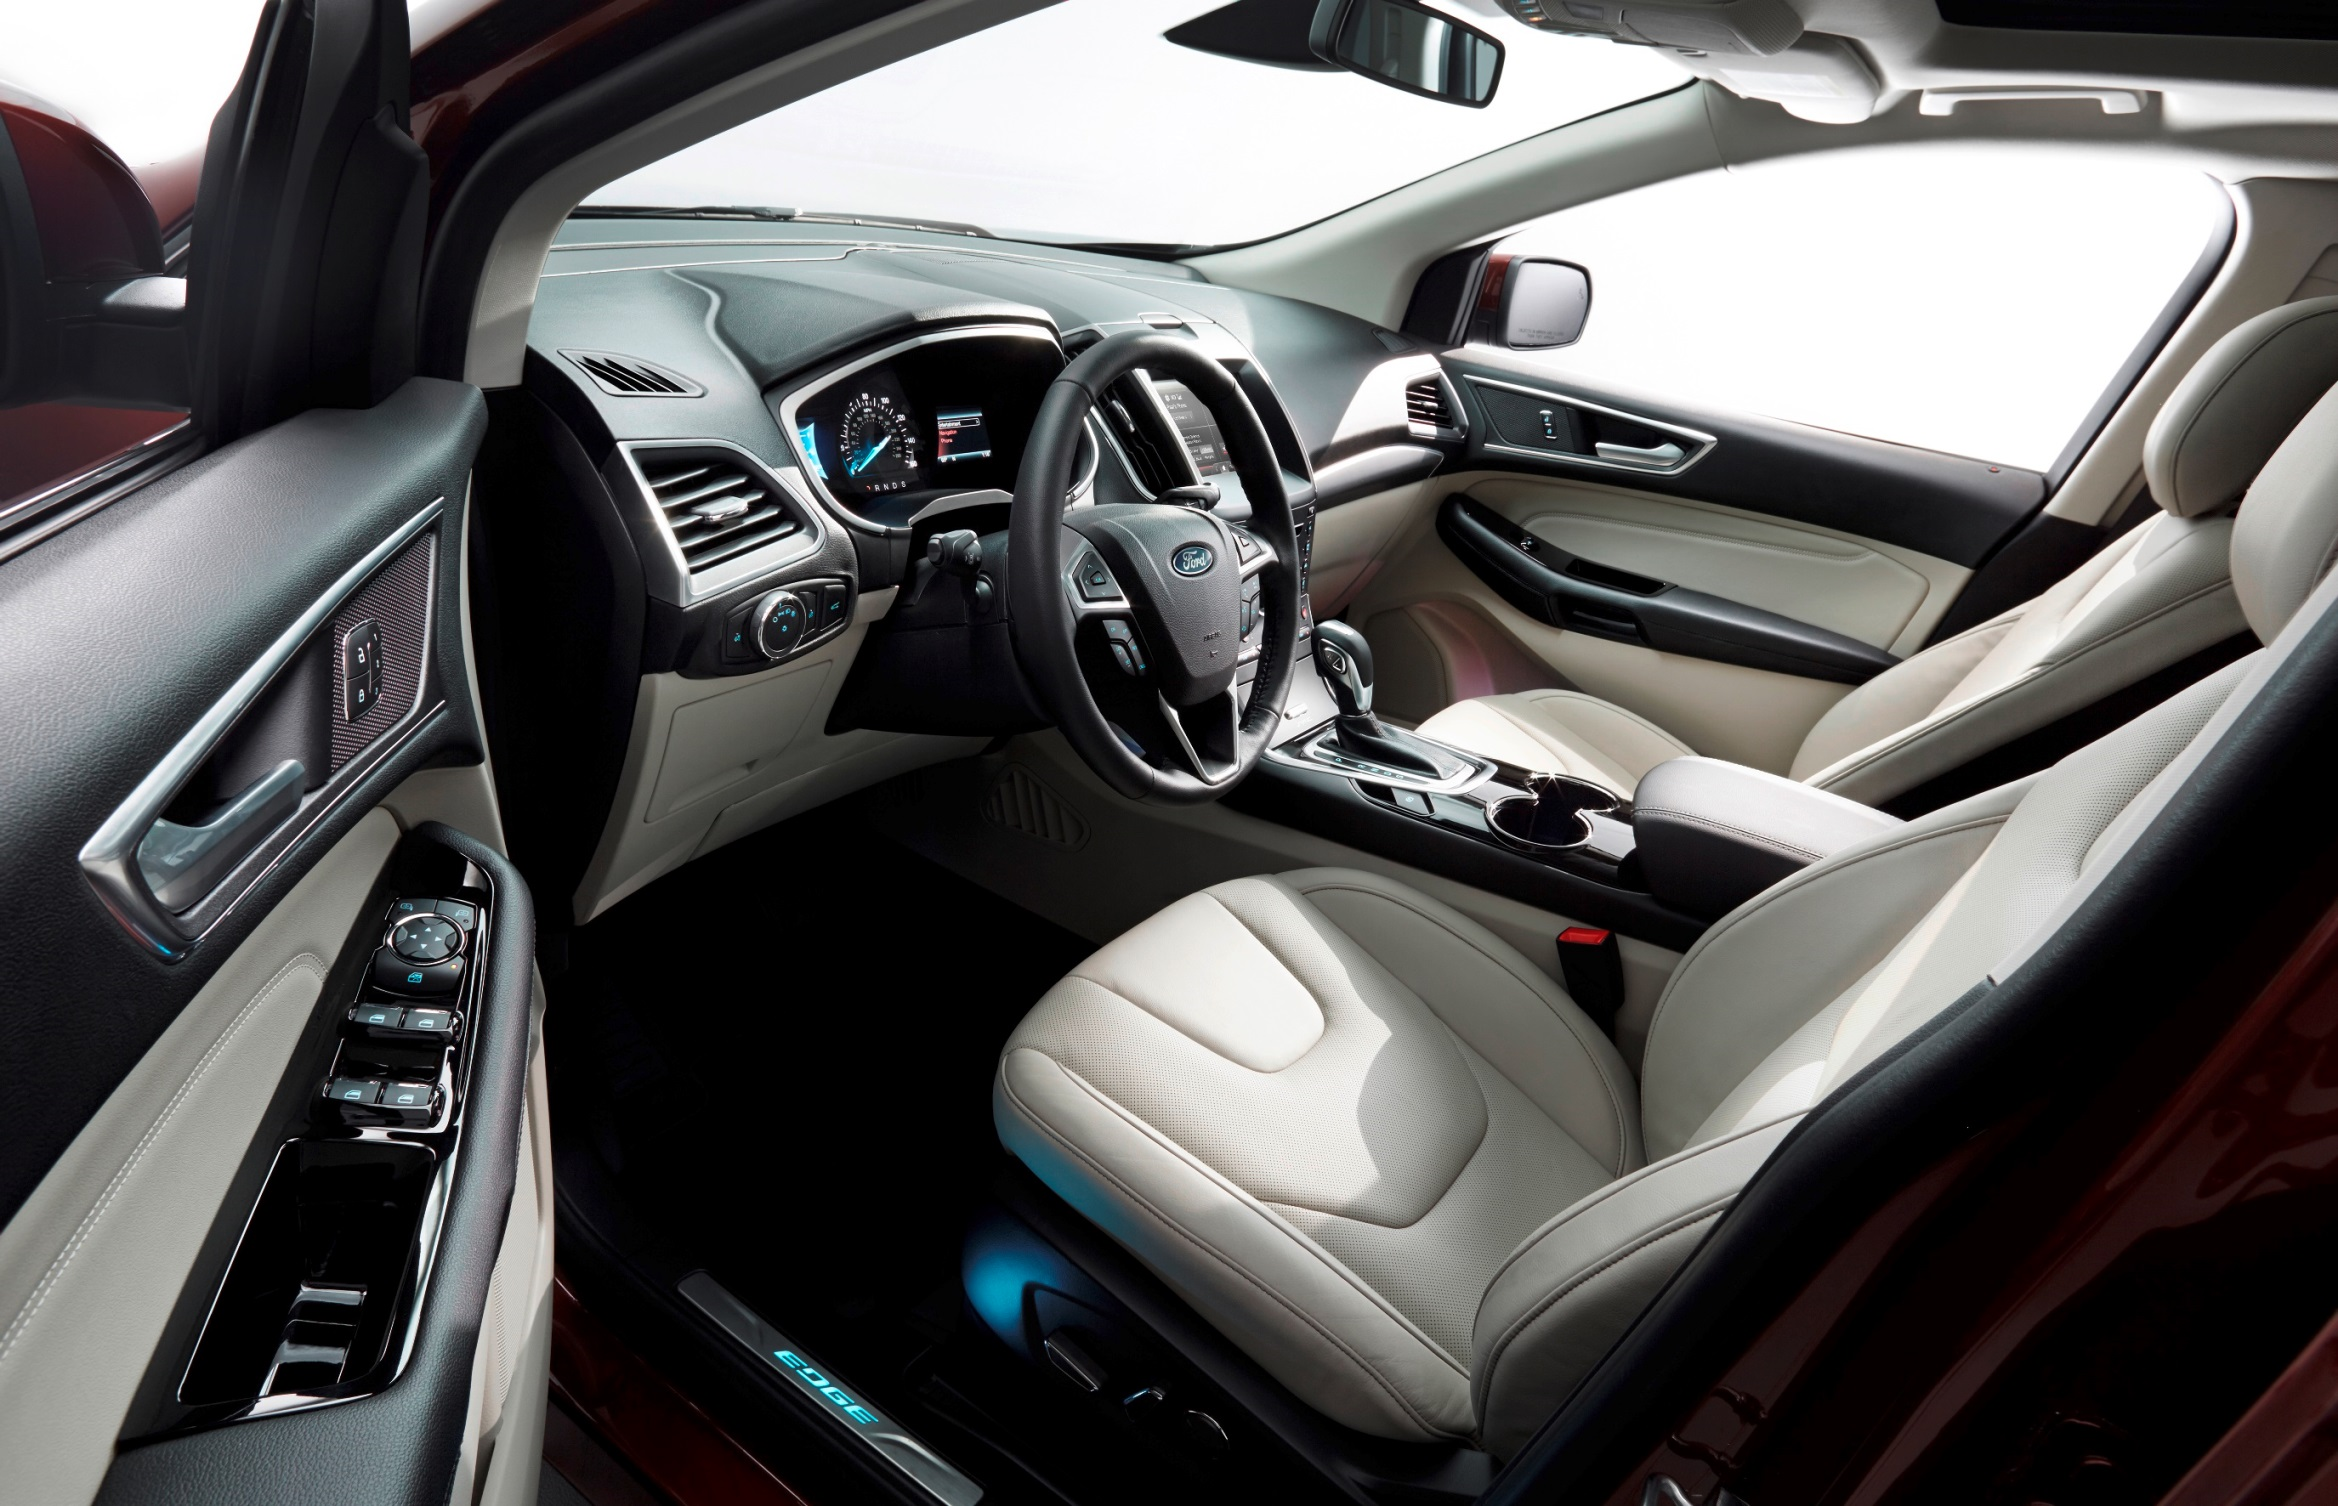 27 Ford_Edge interior